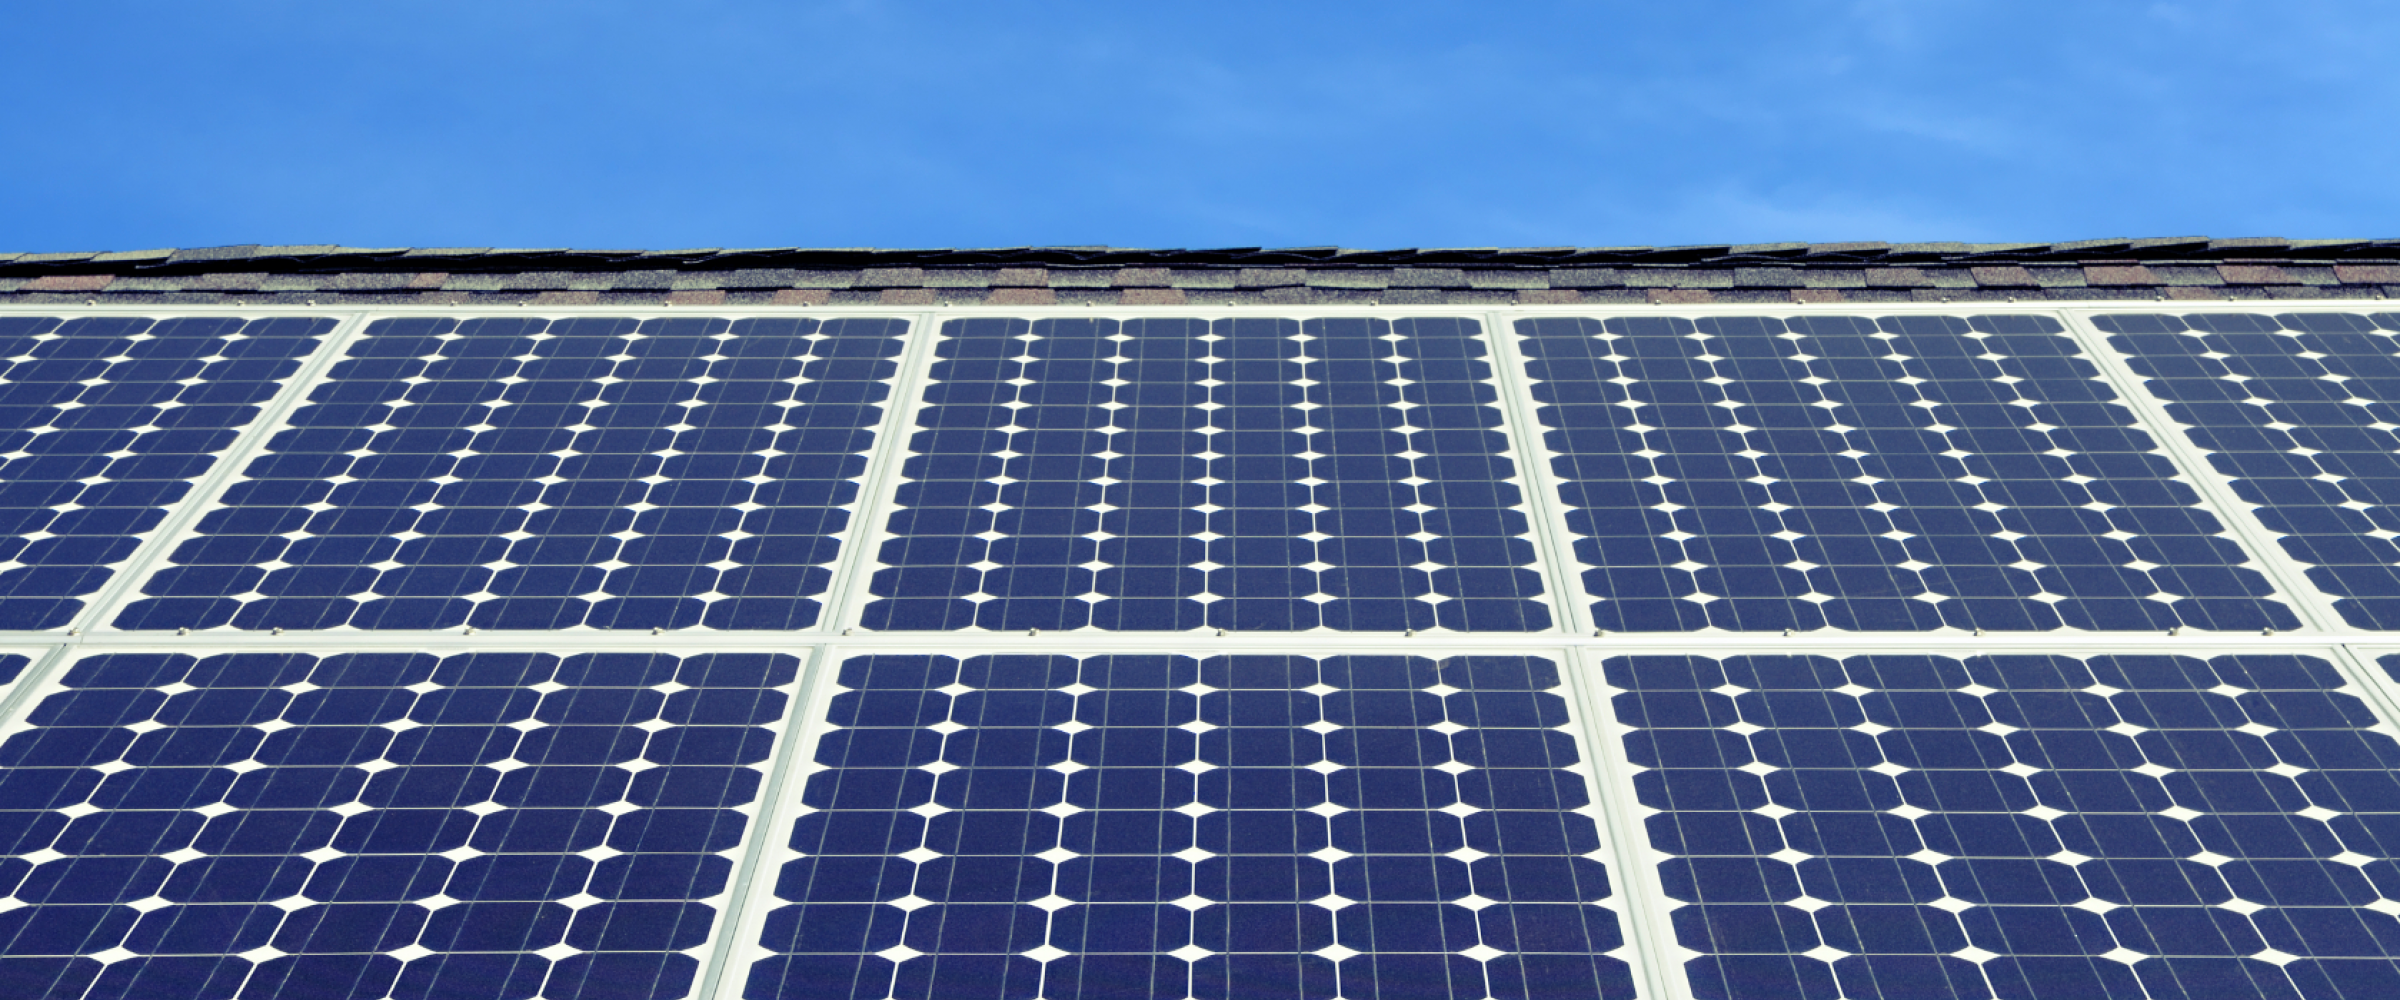 solar panels sky